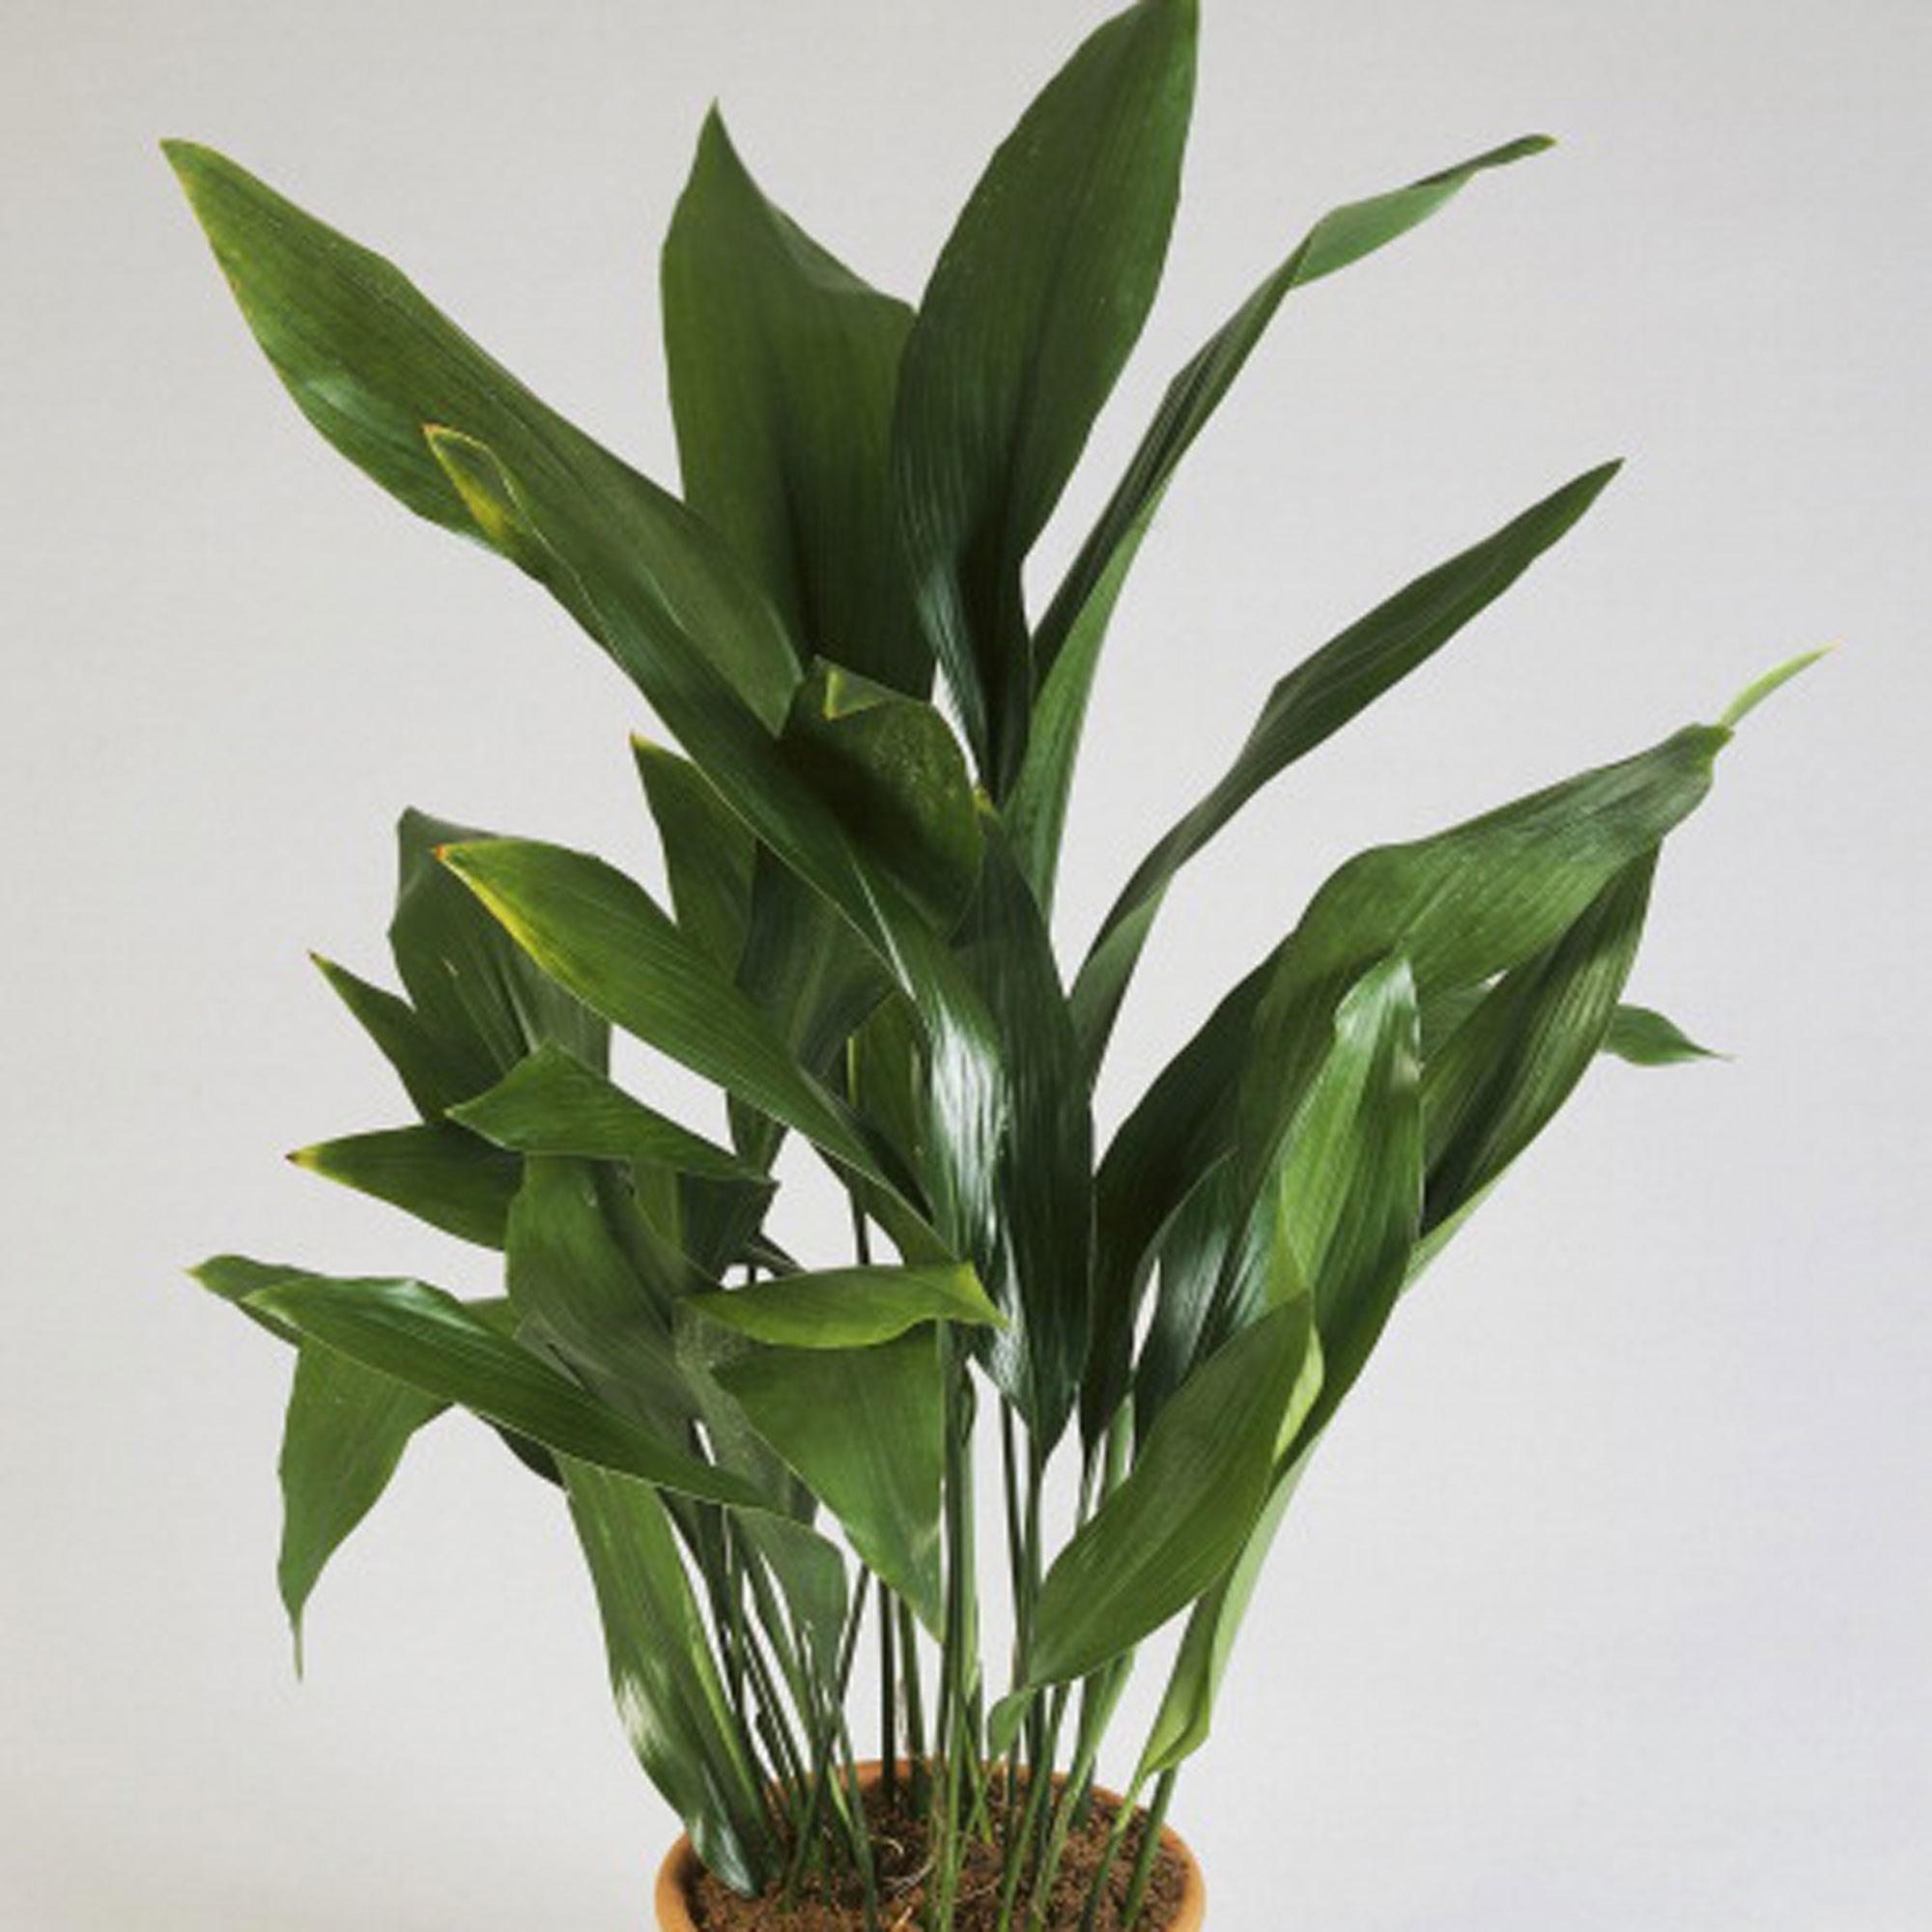 Best Kitchen Gallery: Best Low Light Houseplants Sunset Sunset Magazine of Household Tropical Plants on rachelxblog.com